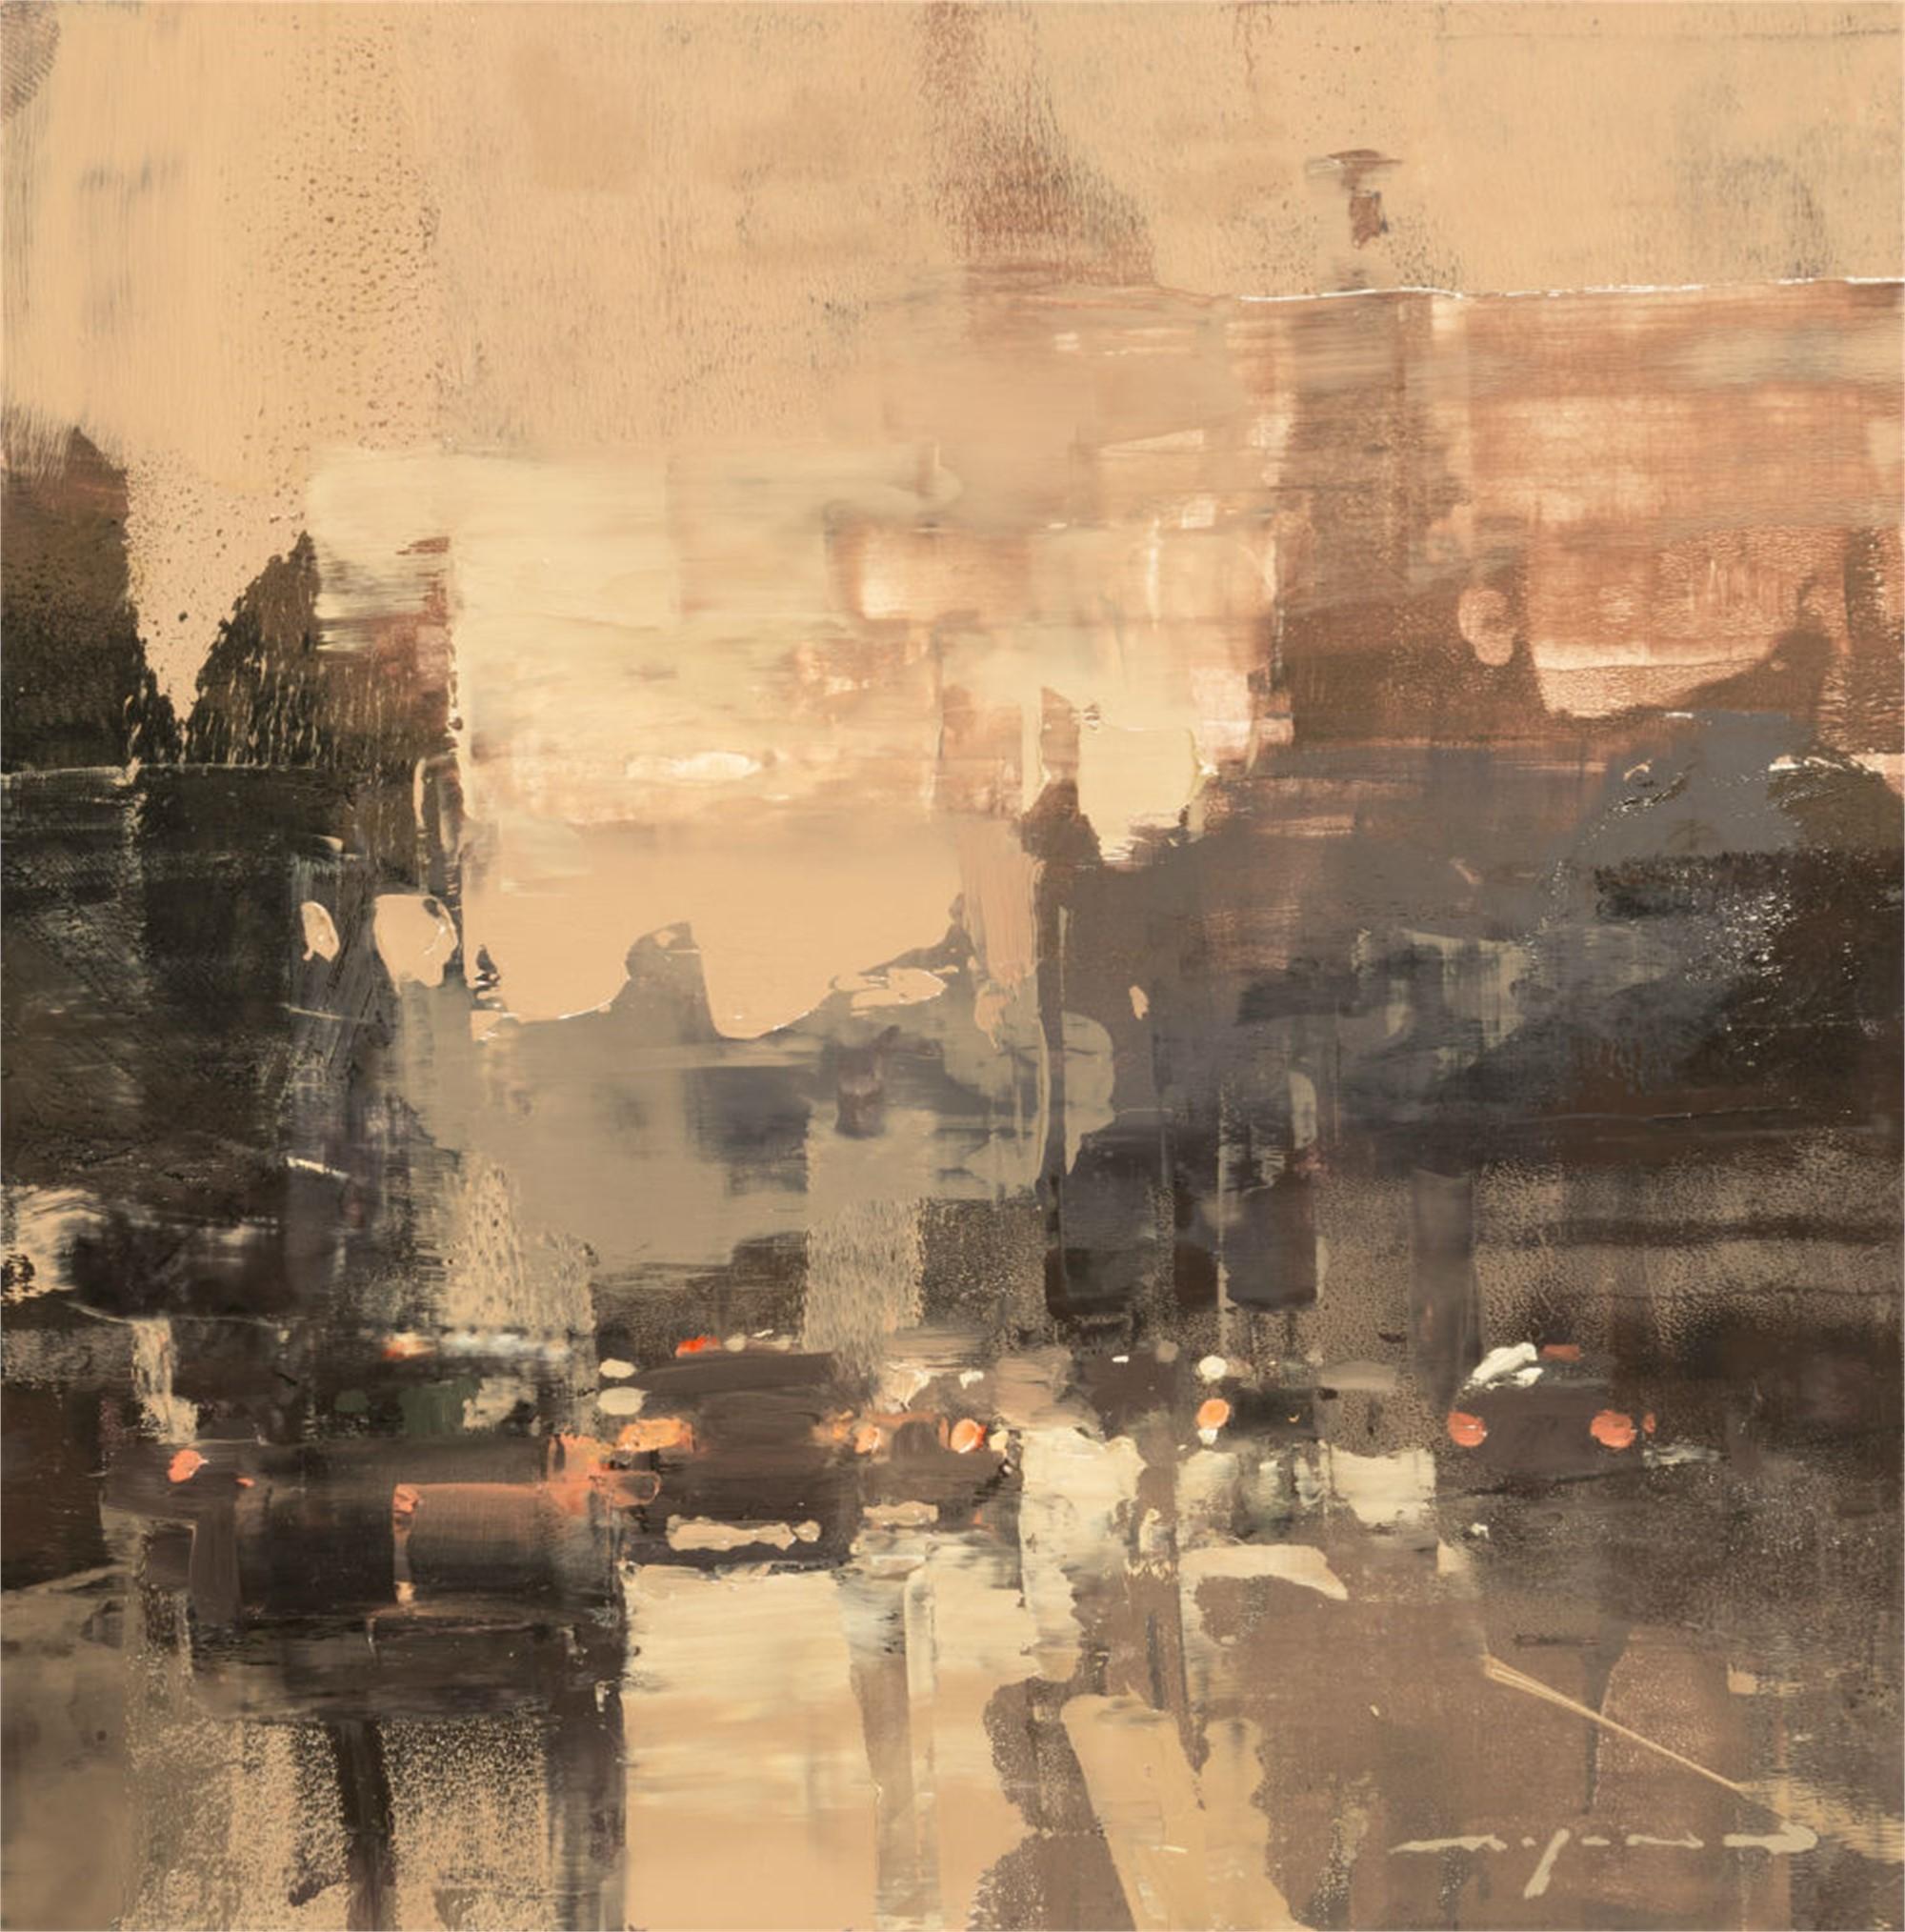 Cityscape - Composed Form Study no. 23 by Jeremy Mann